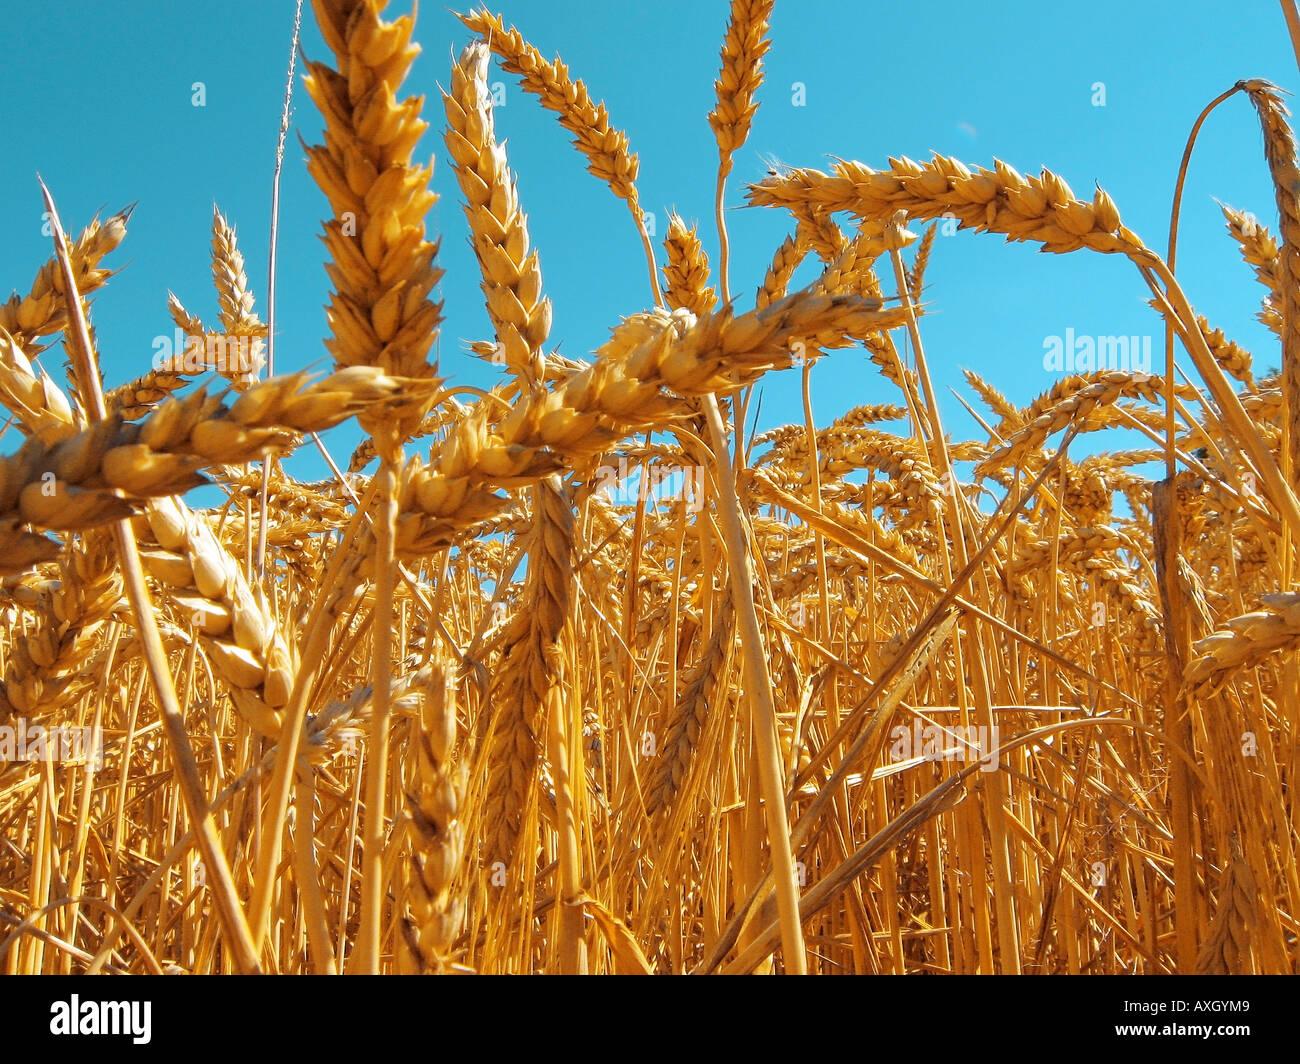 wheat Weizenähren Stock Photo